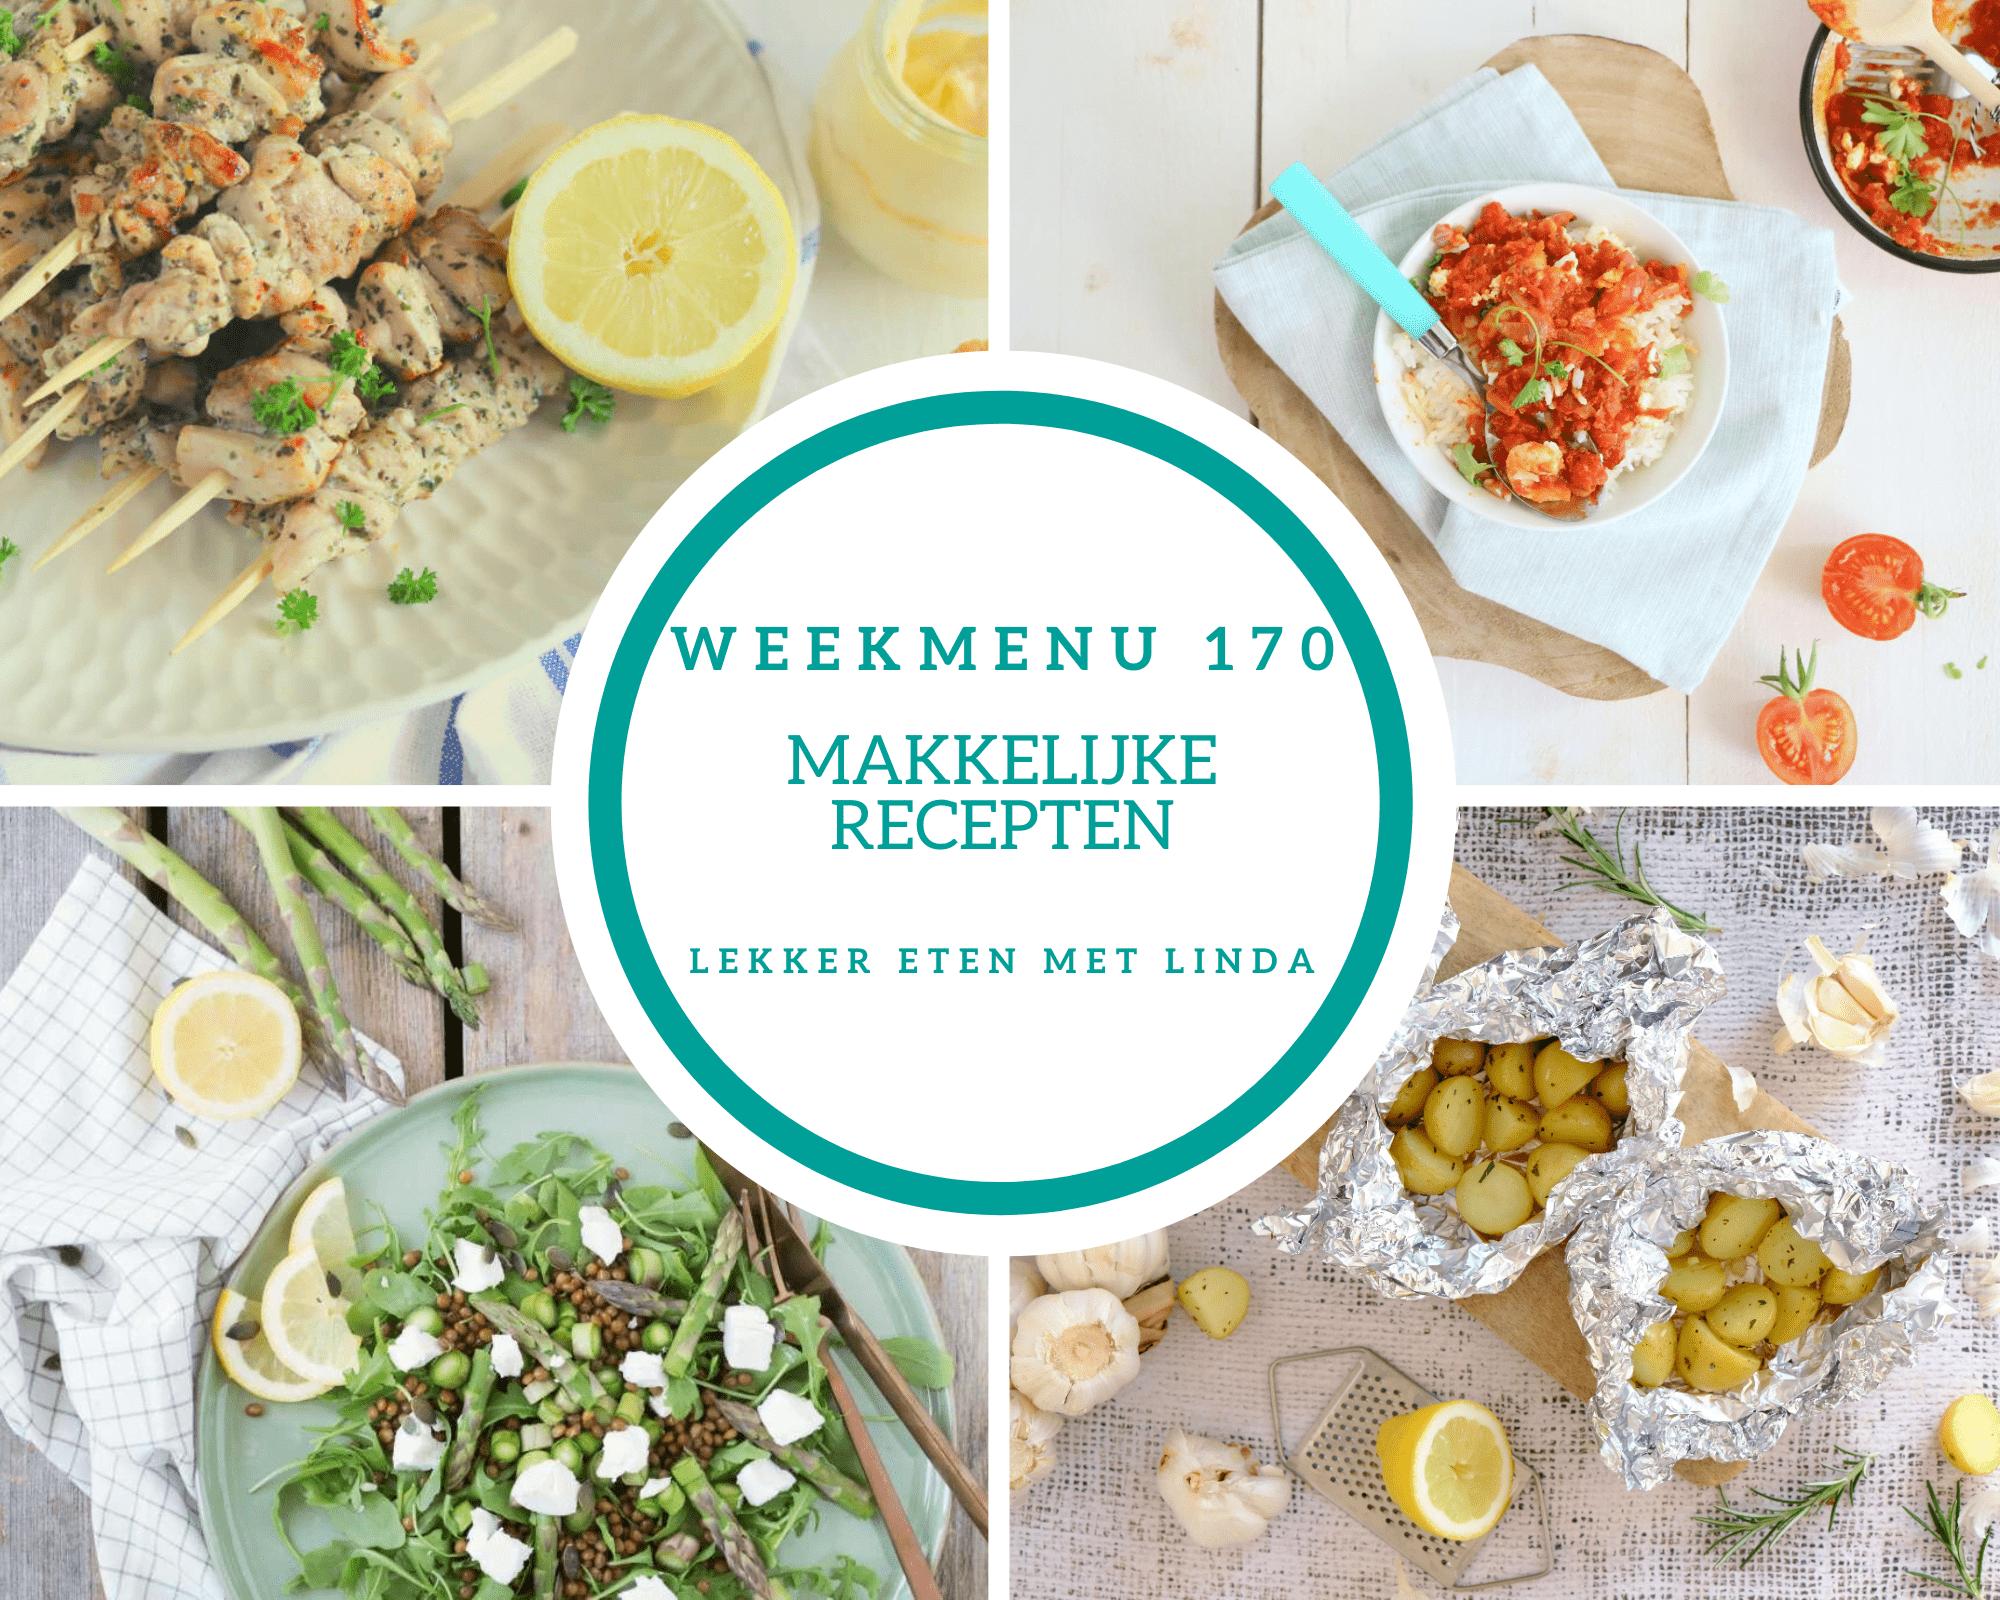 Weekmenu 170 makkelijke recepten